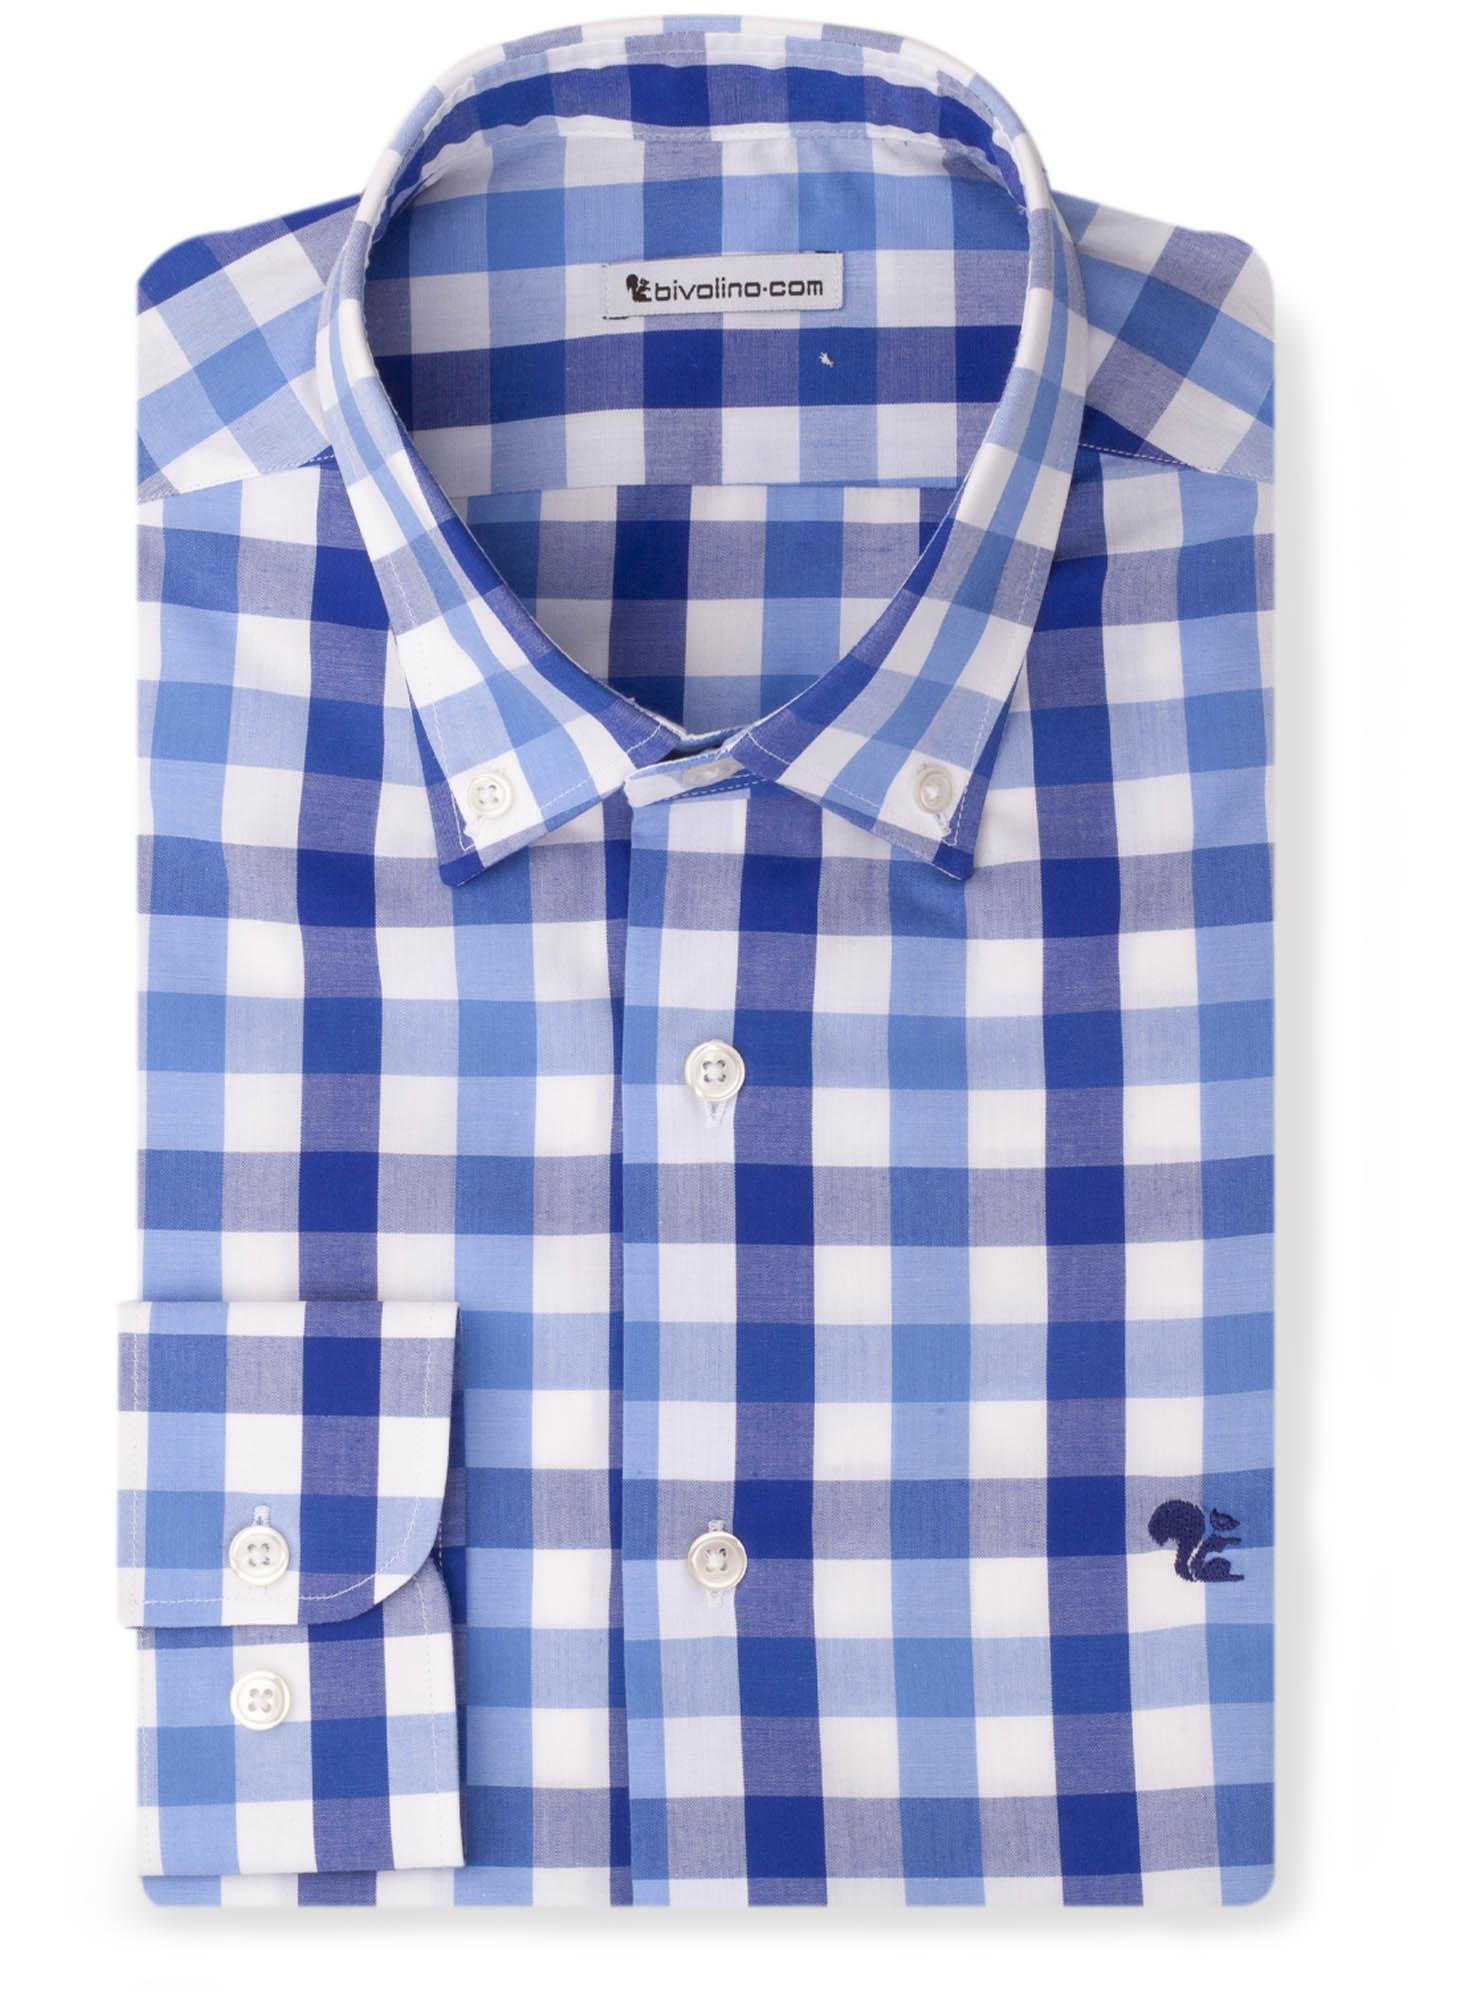 LADOBORA - madras ruit popeline overhemd - LADO 2